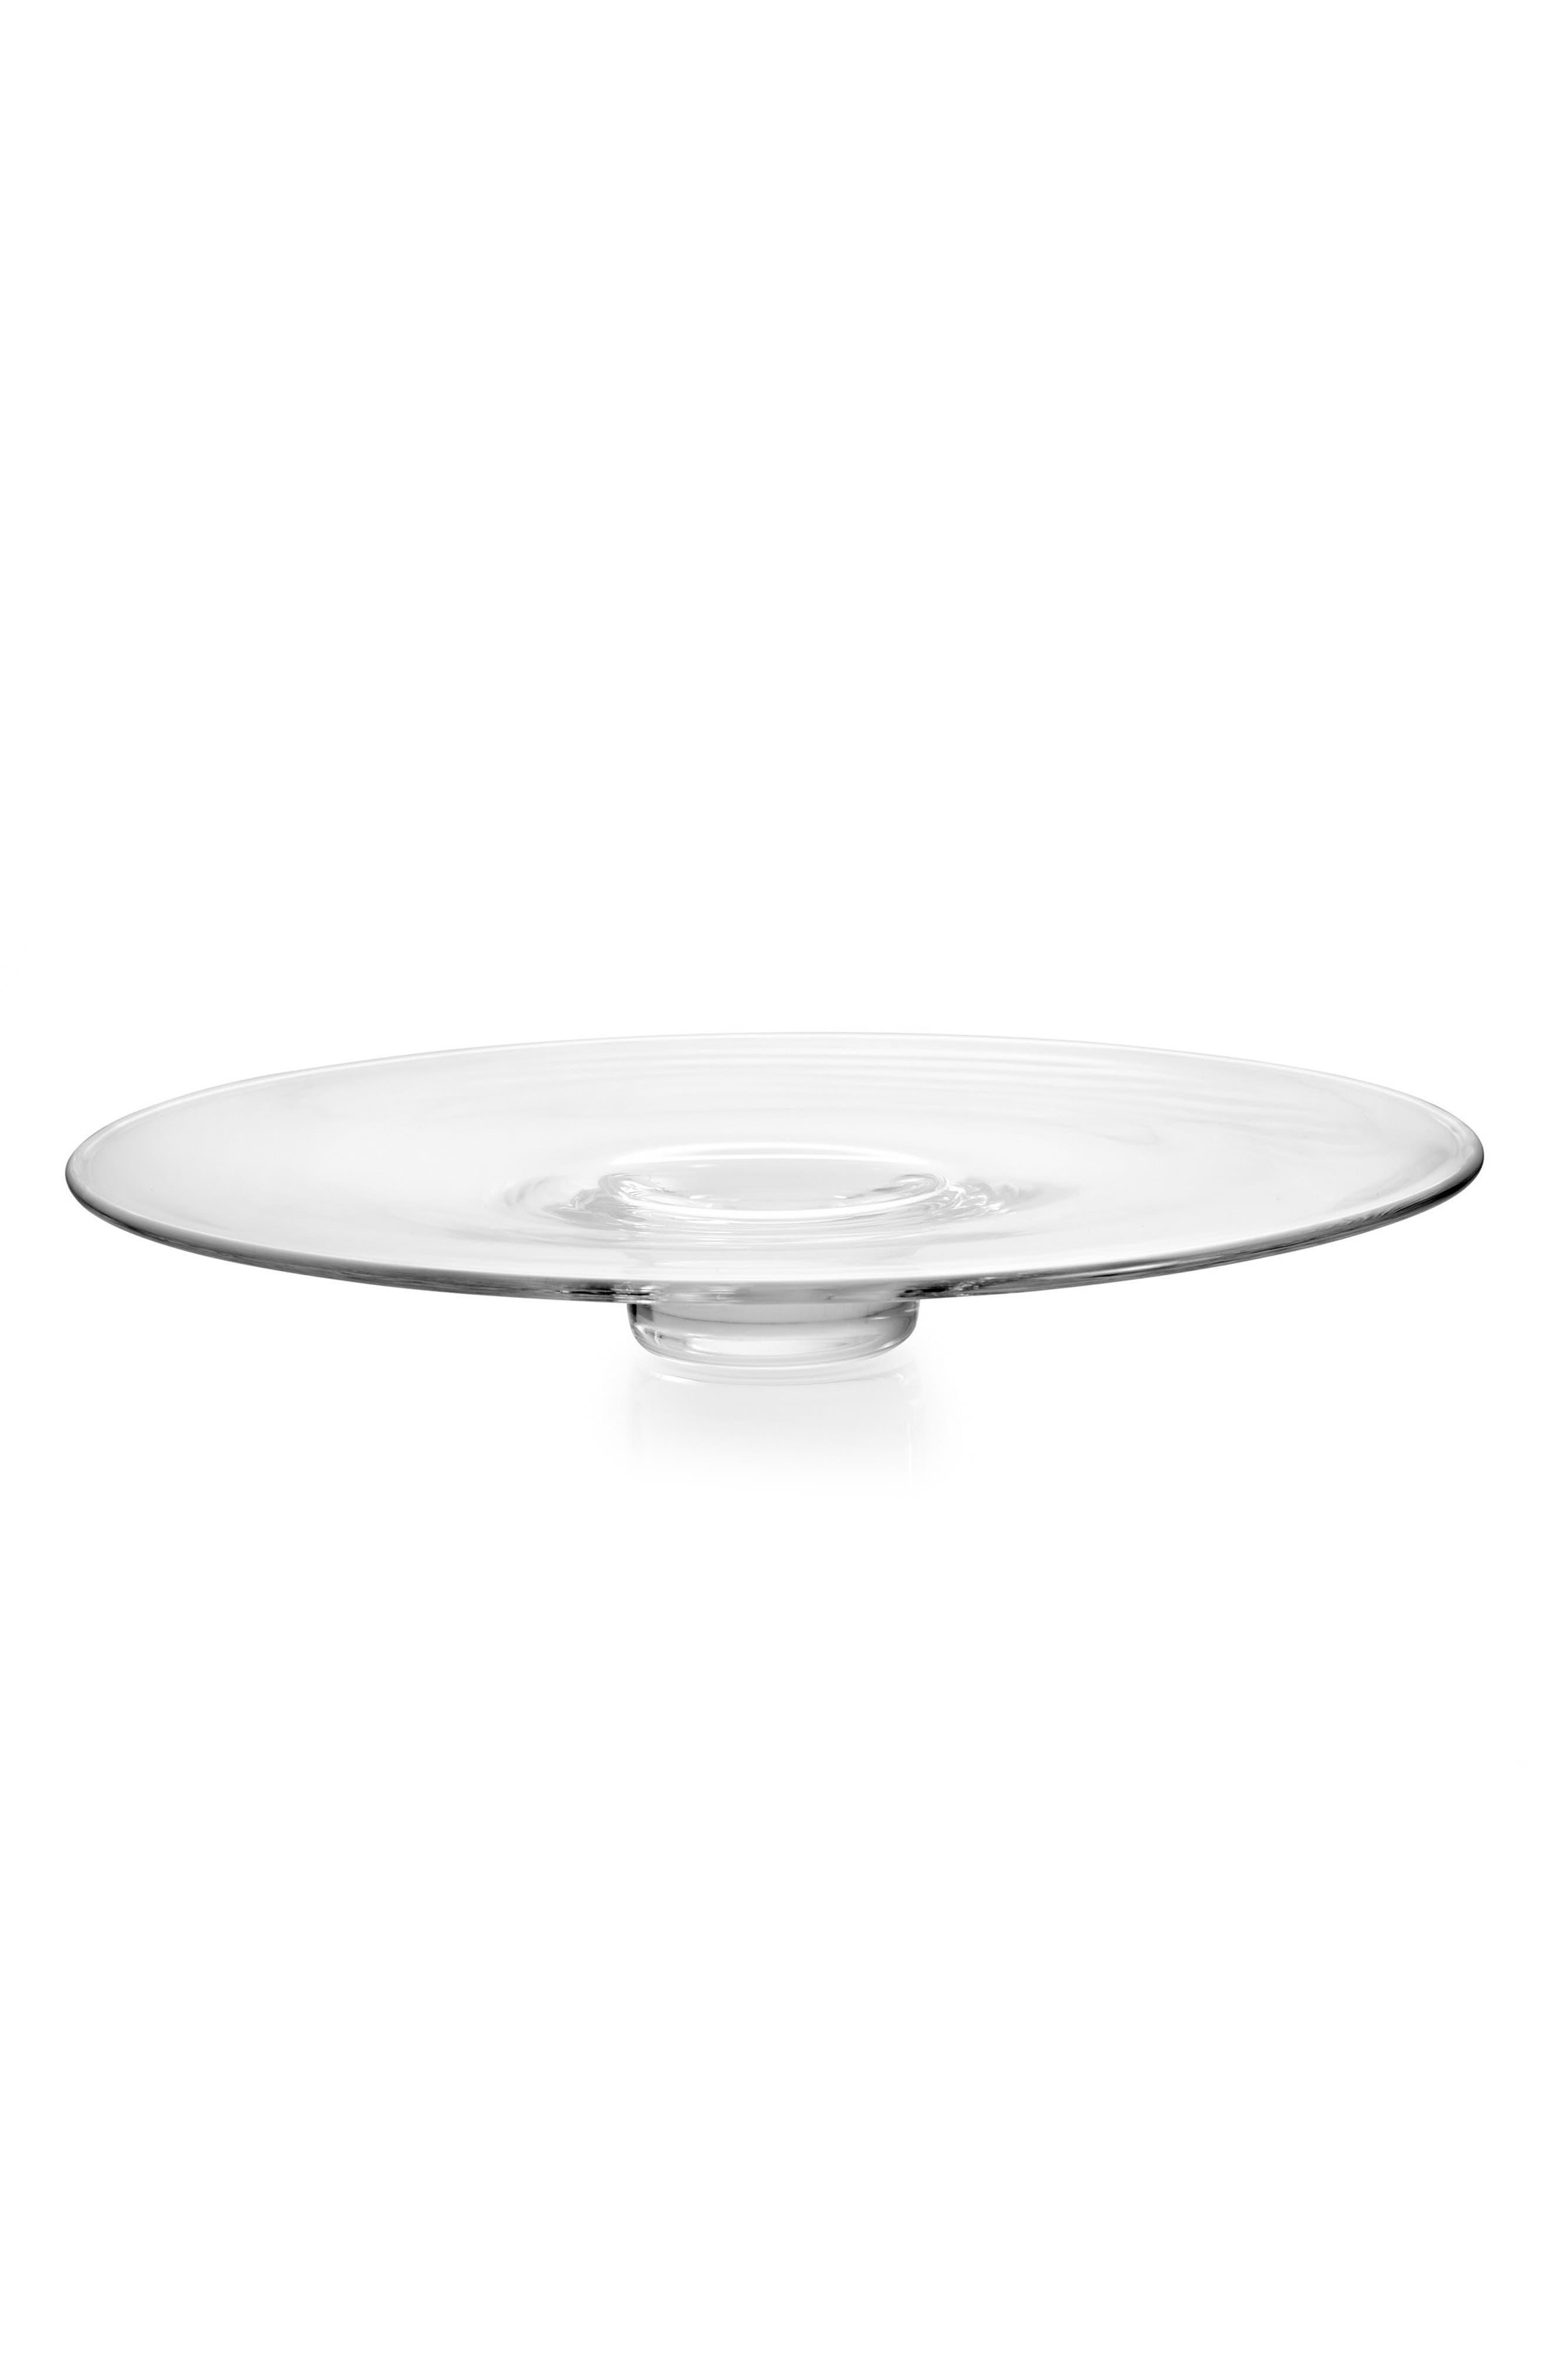 Main Image - Nambé Moderne Round Platter